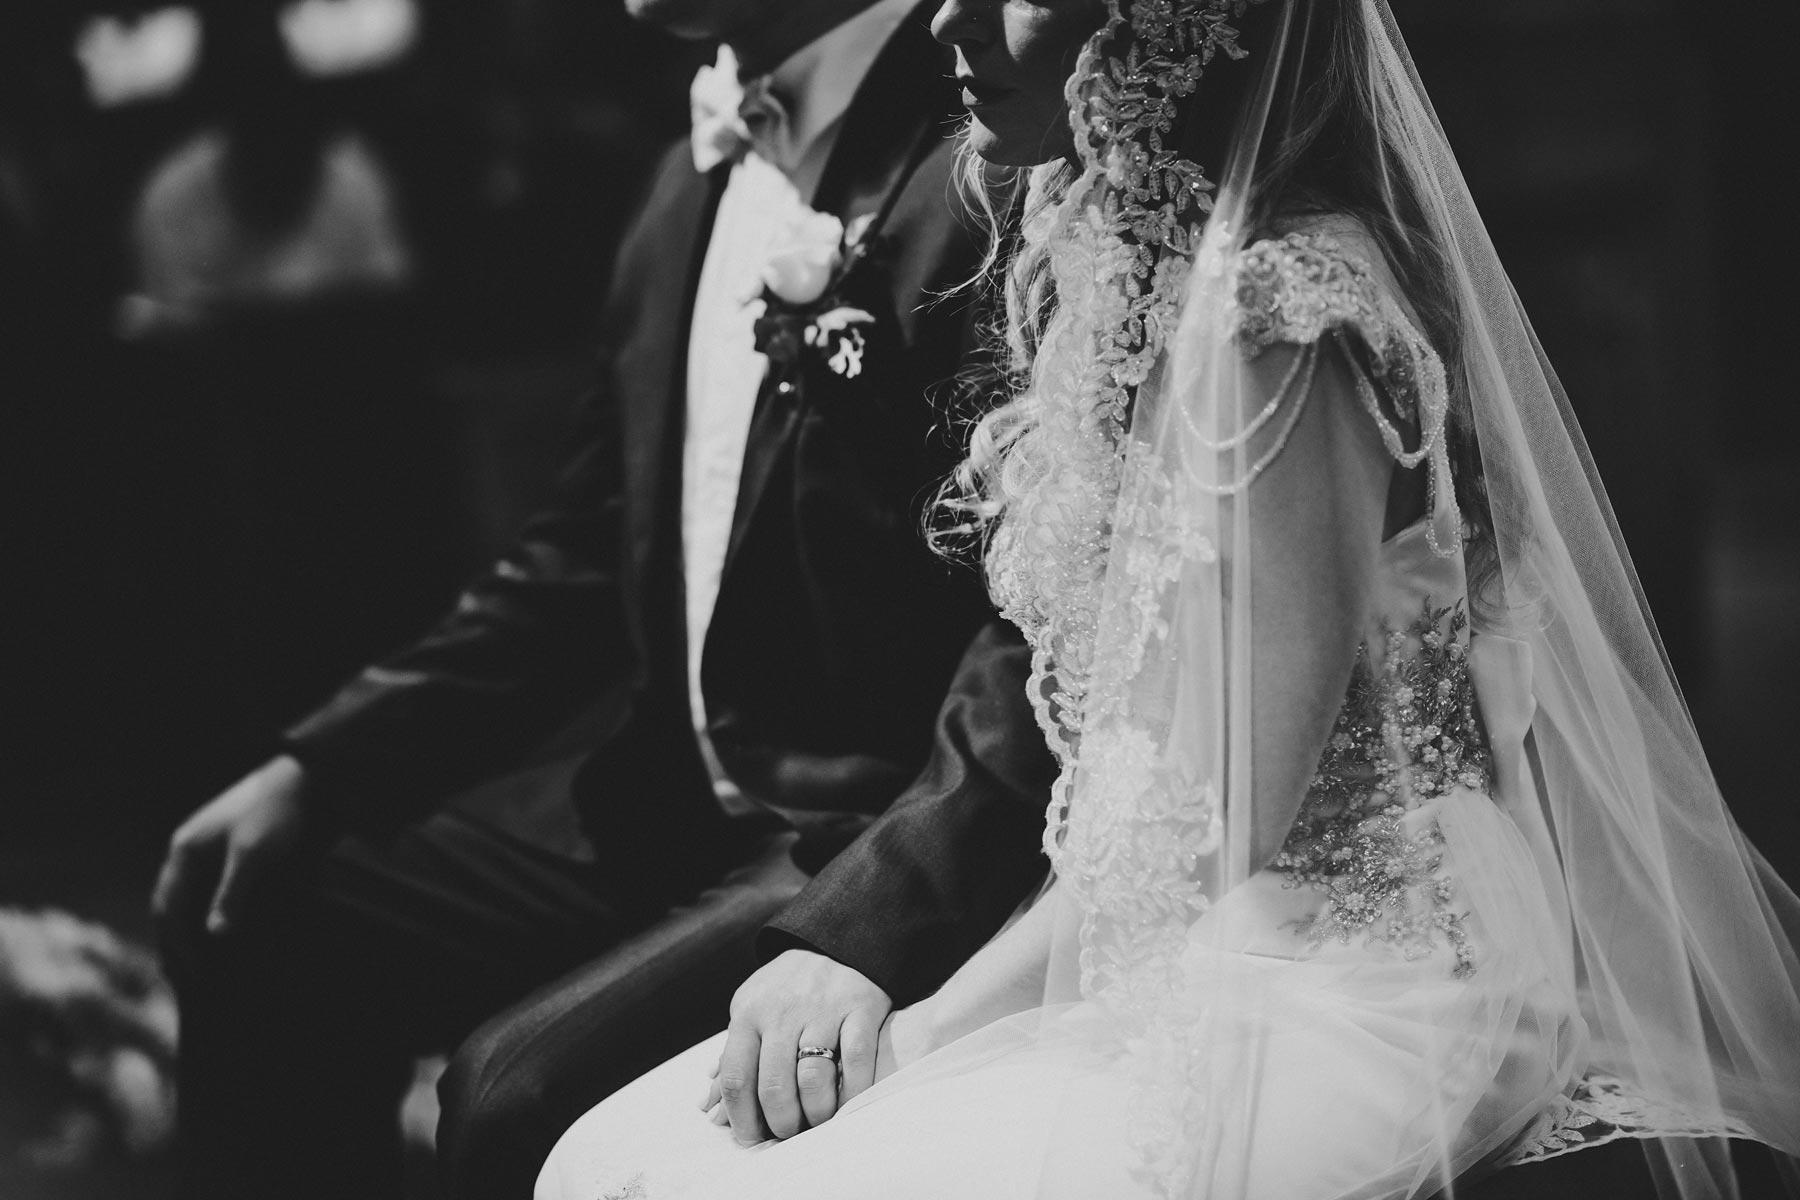 fotografo-de-bodas-en-monterrey-15